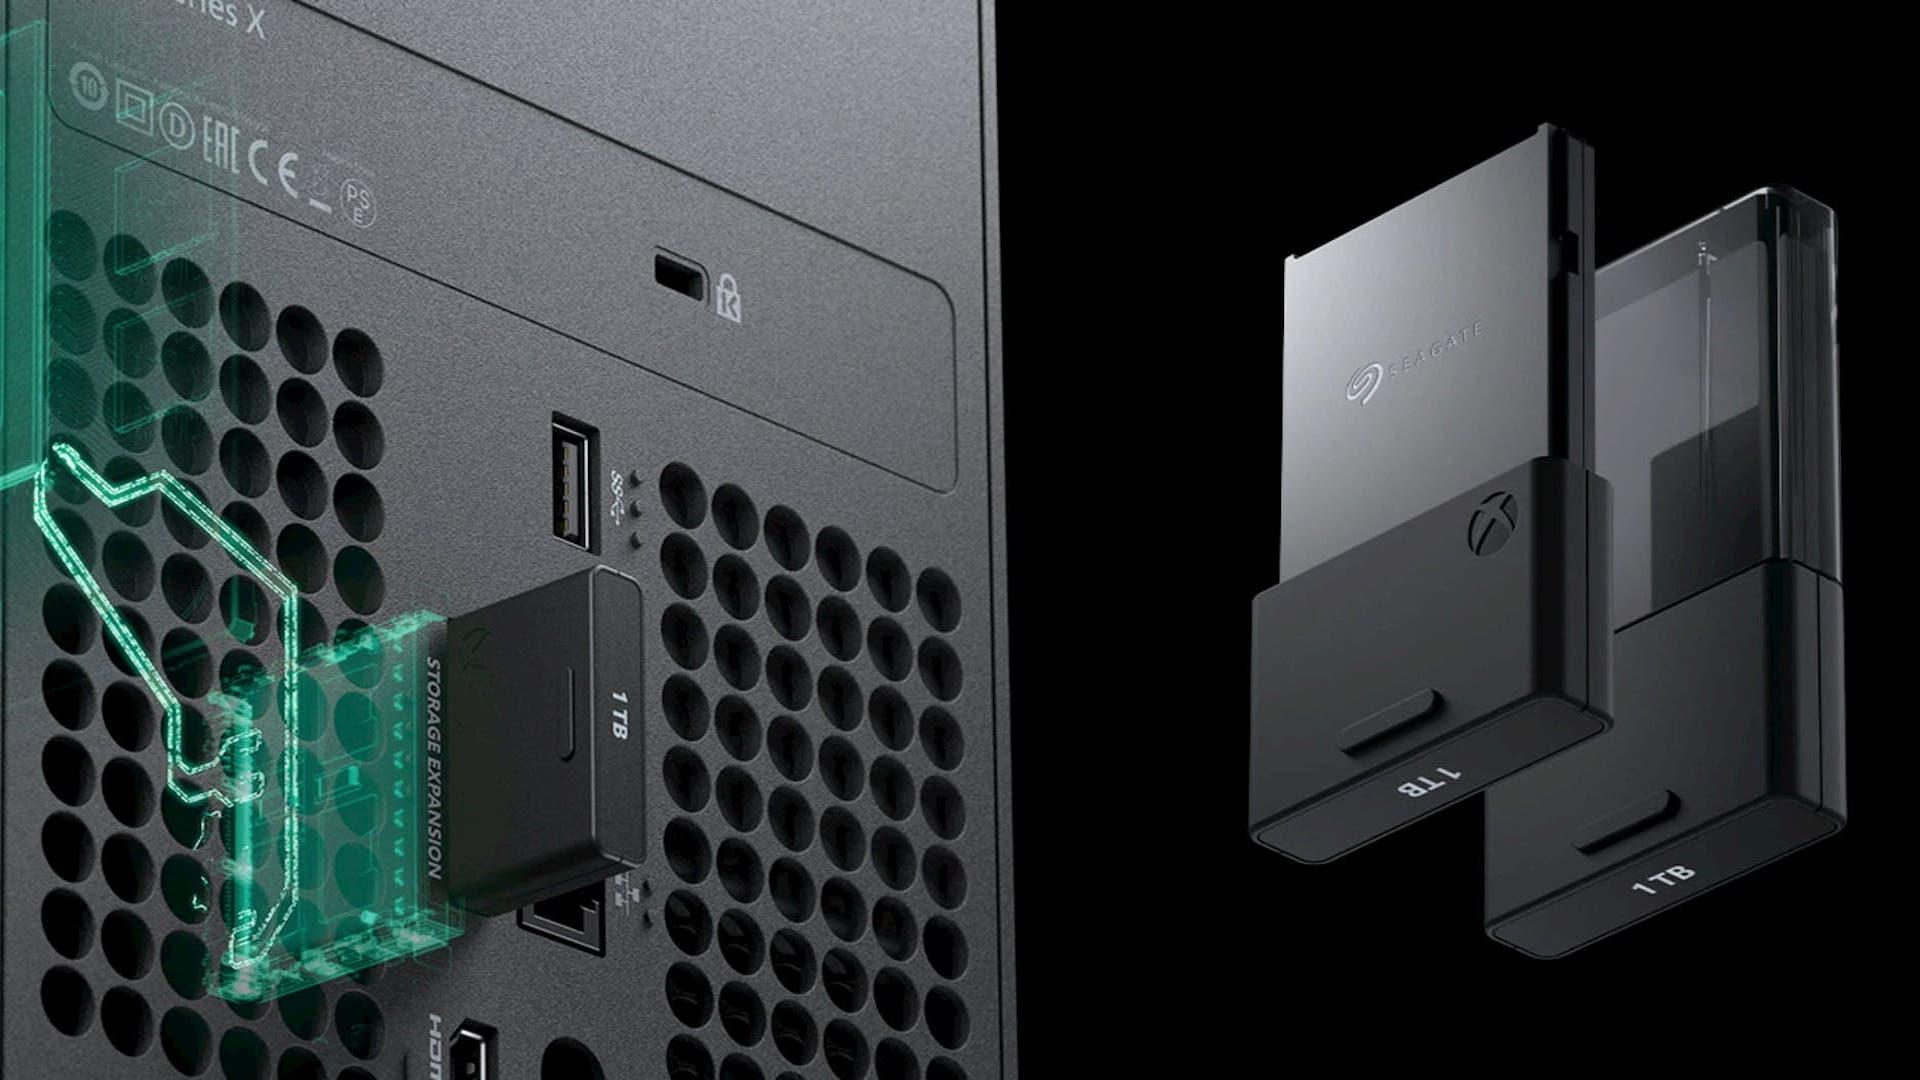 Seagate - Tarjetas de expansión Xbox Series X